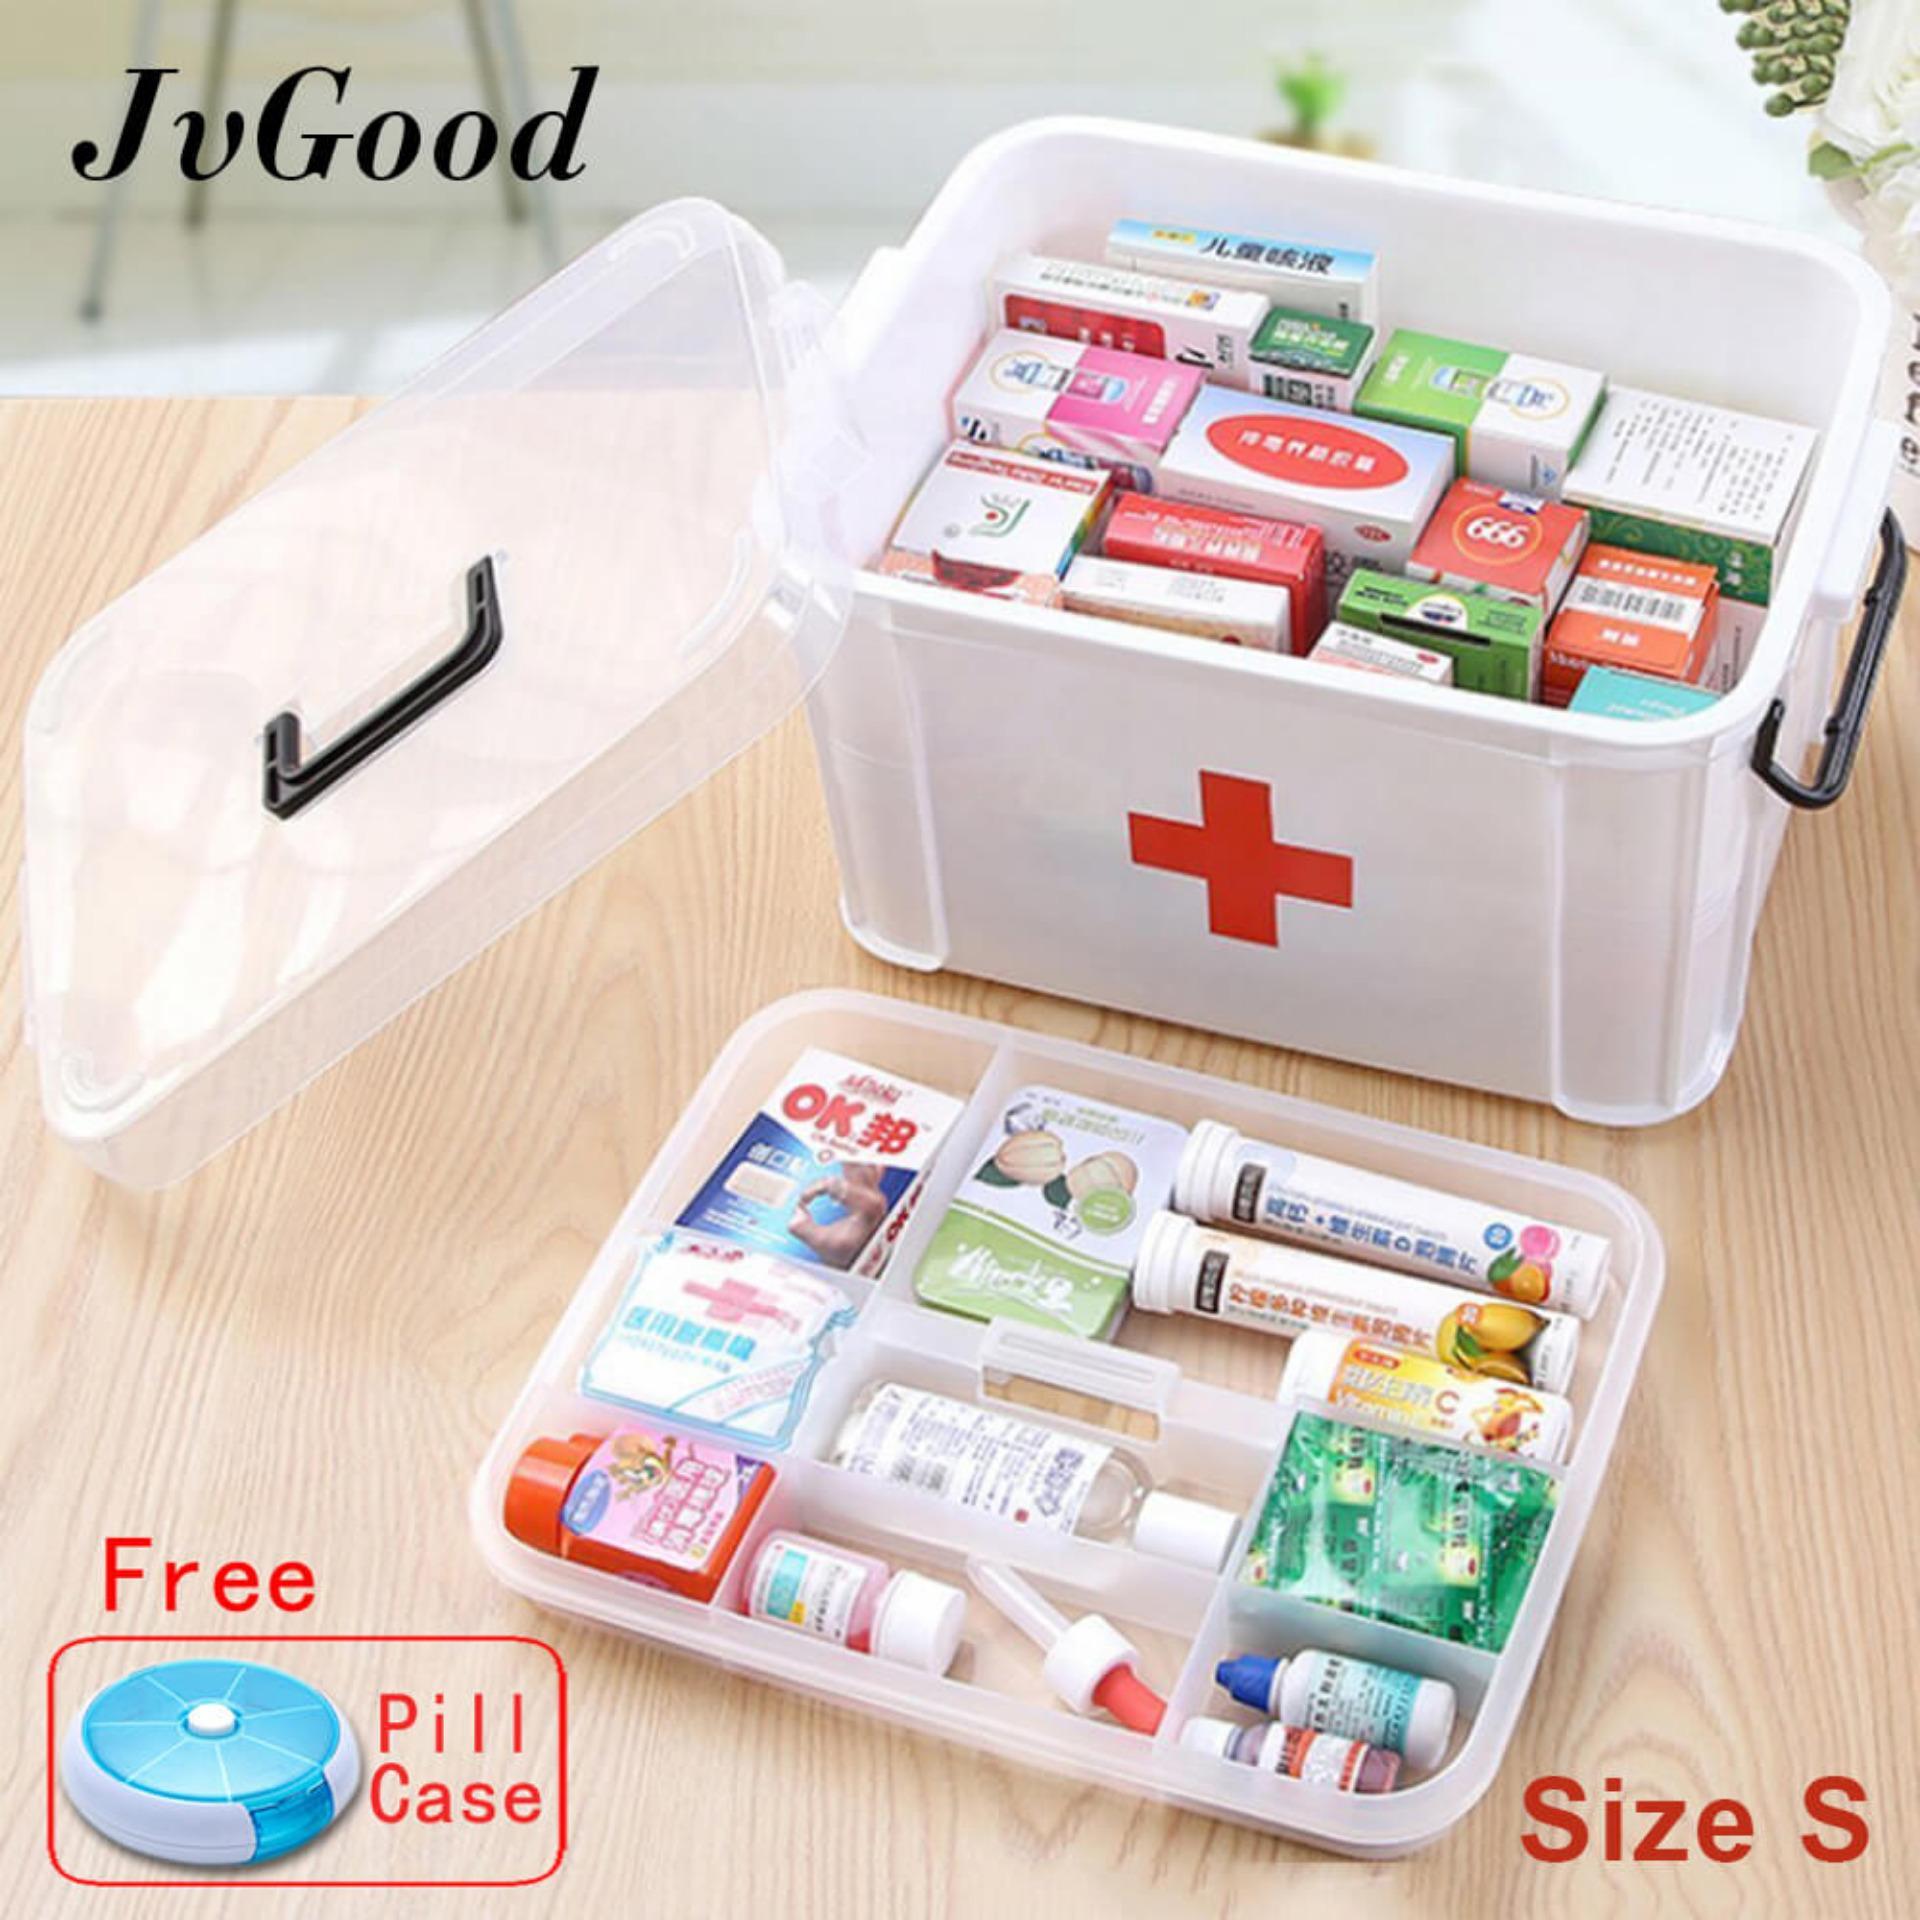 Promo Jvgood Rumah Tangga Medis Kabinet Kotak Kosong First Aid Kit Penyimpanan Plastik Case Pil With Kompartemen Java Me Ukuran S 24 5X17 5X13 5 Cm Jvgood